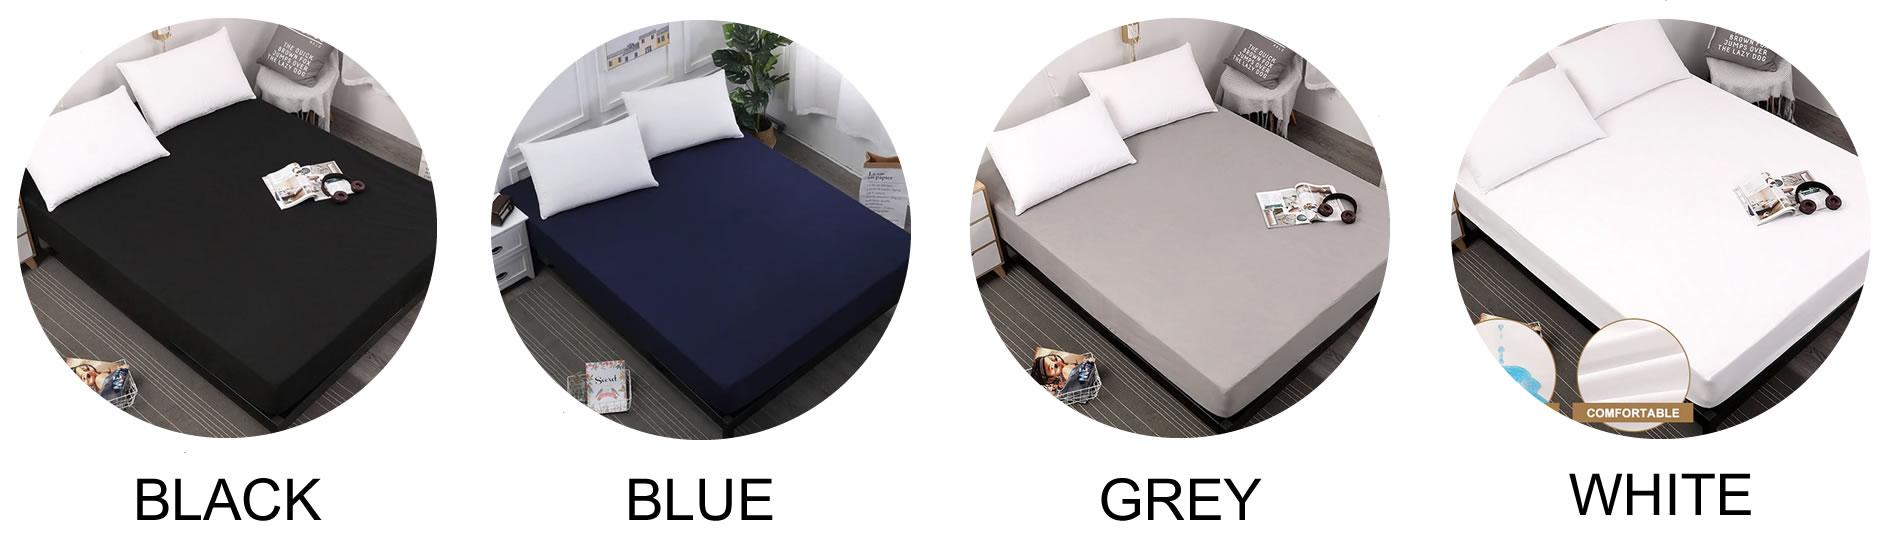 mattress protector waterproof